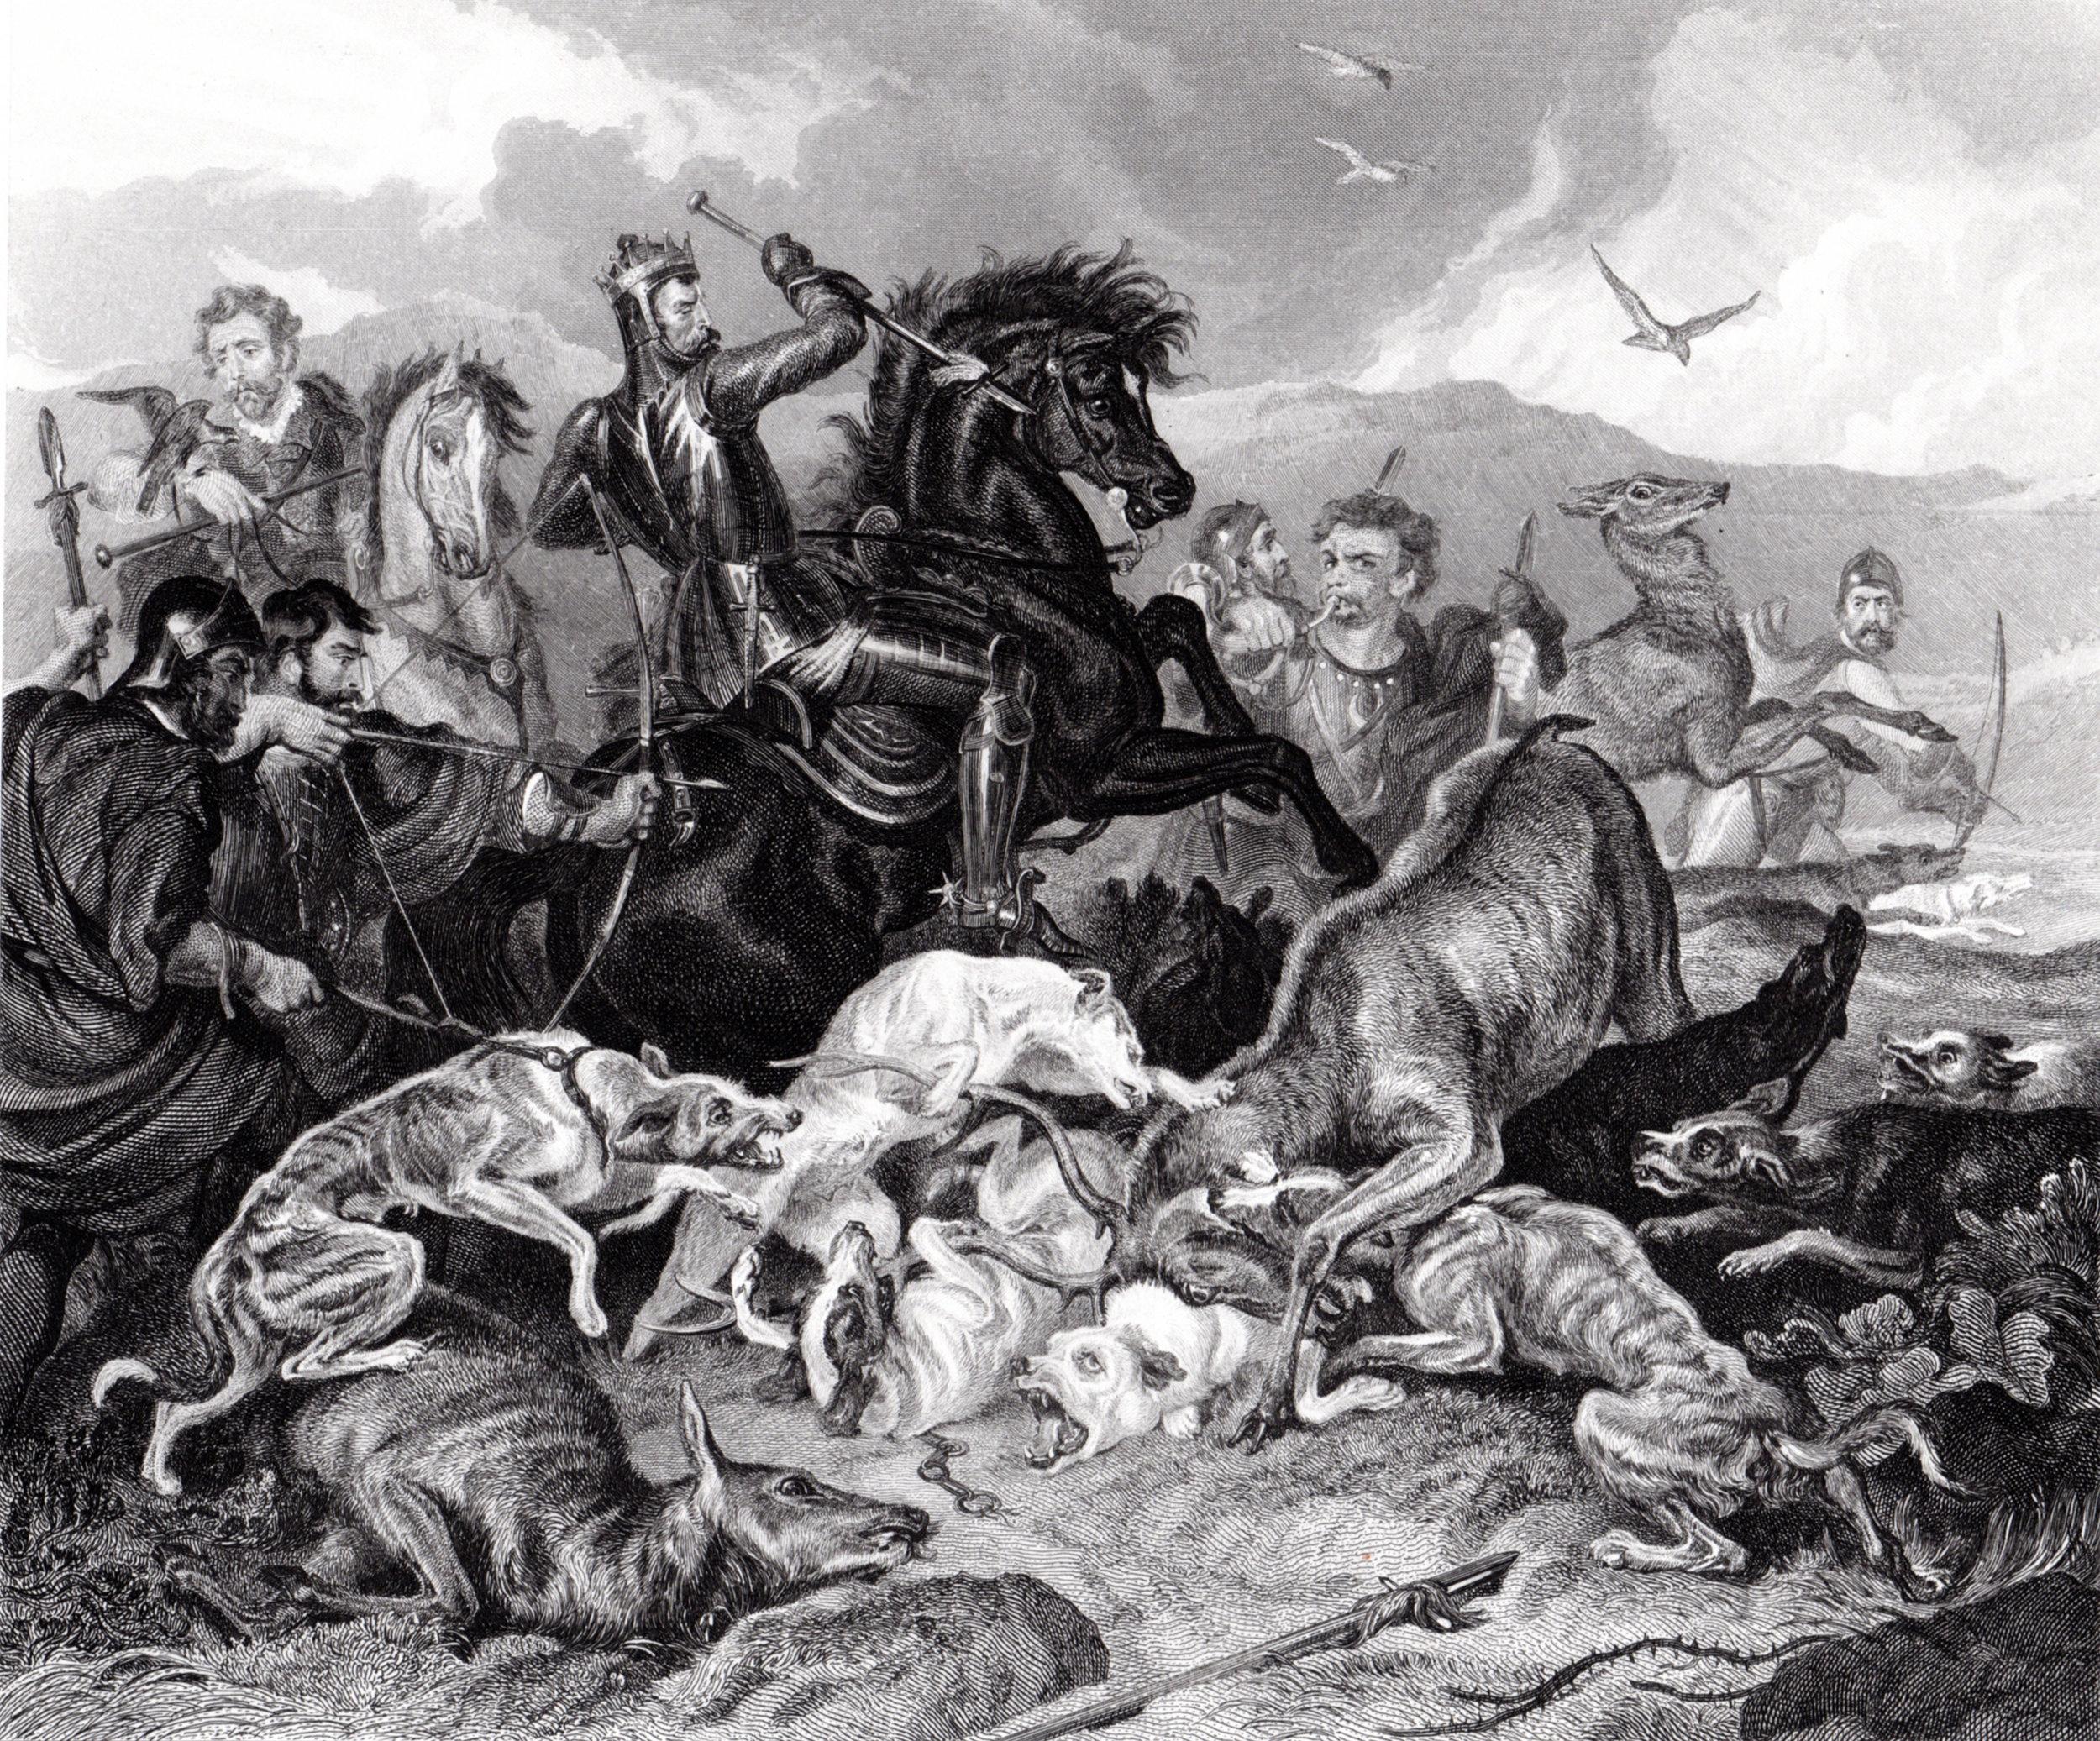 The Works of Sir Edwin Landseer (circa 1875)